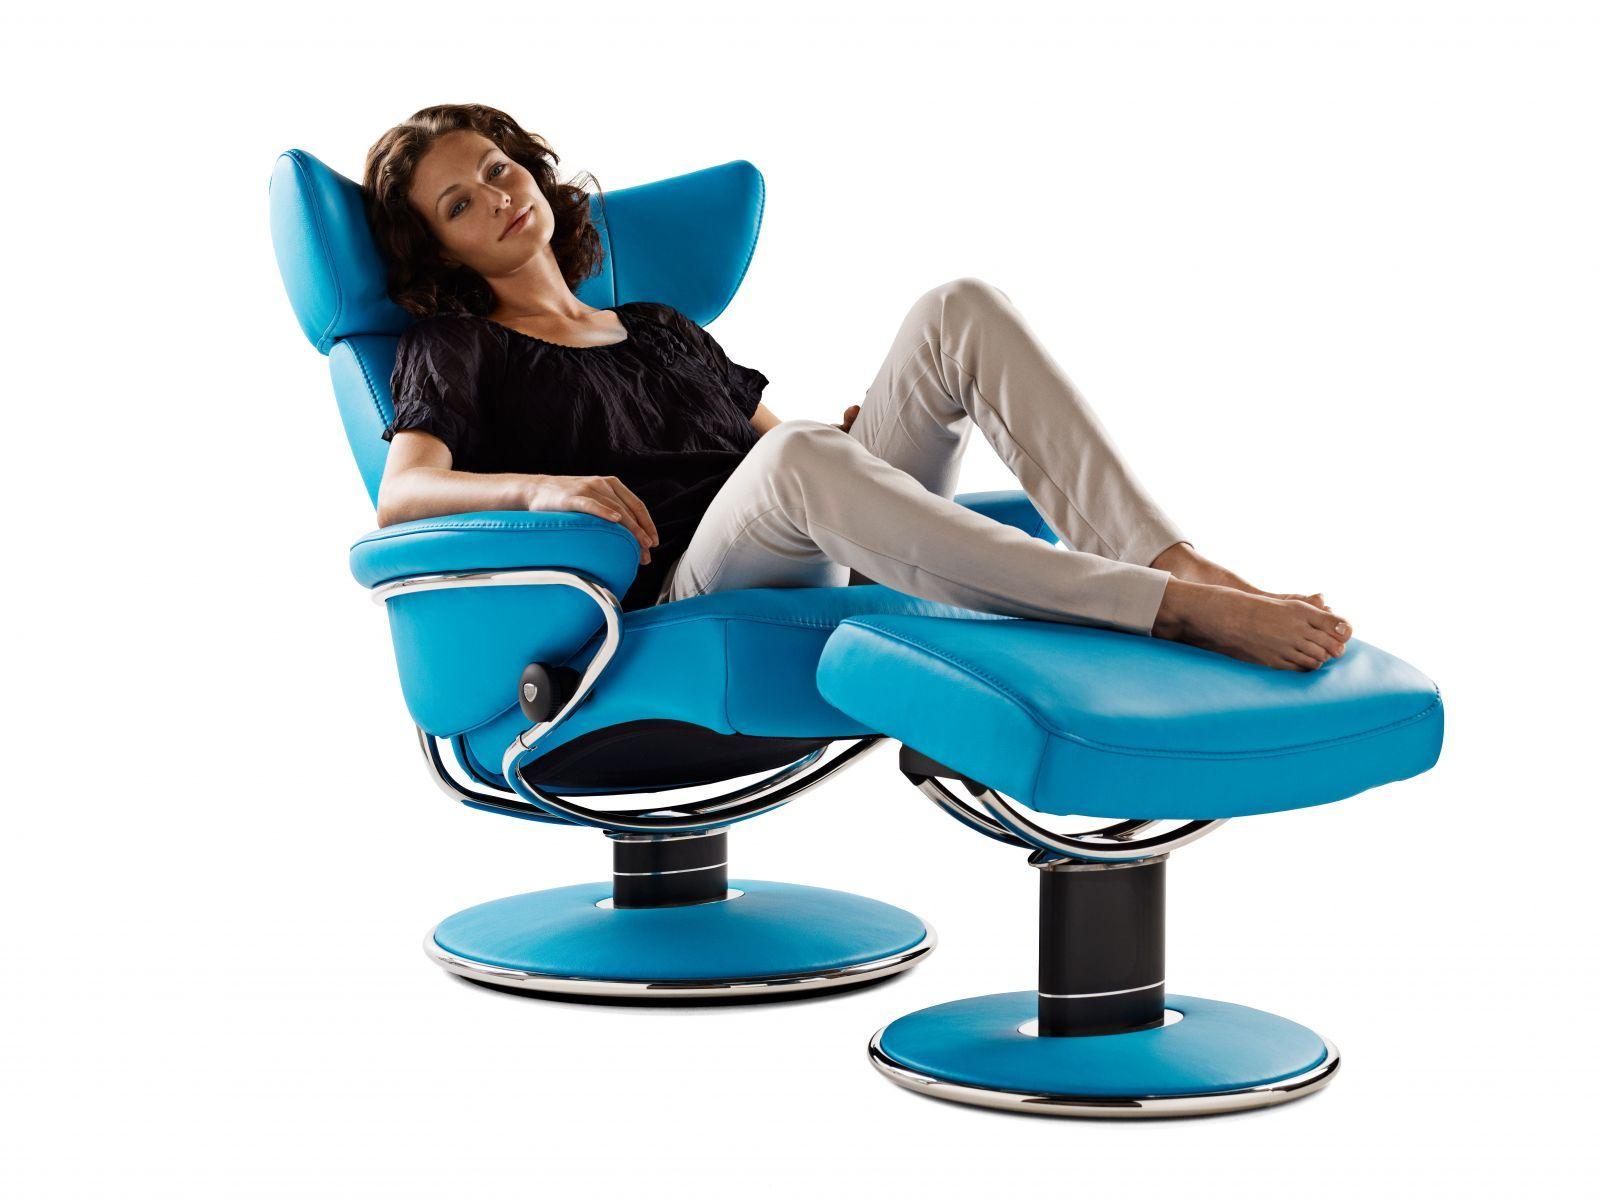 Stressless By Ekornes | Chair U0026 Sofa Showroom Orange County | Ergo